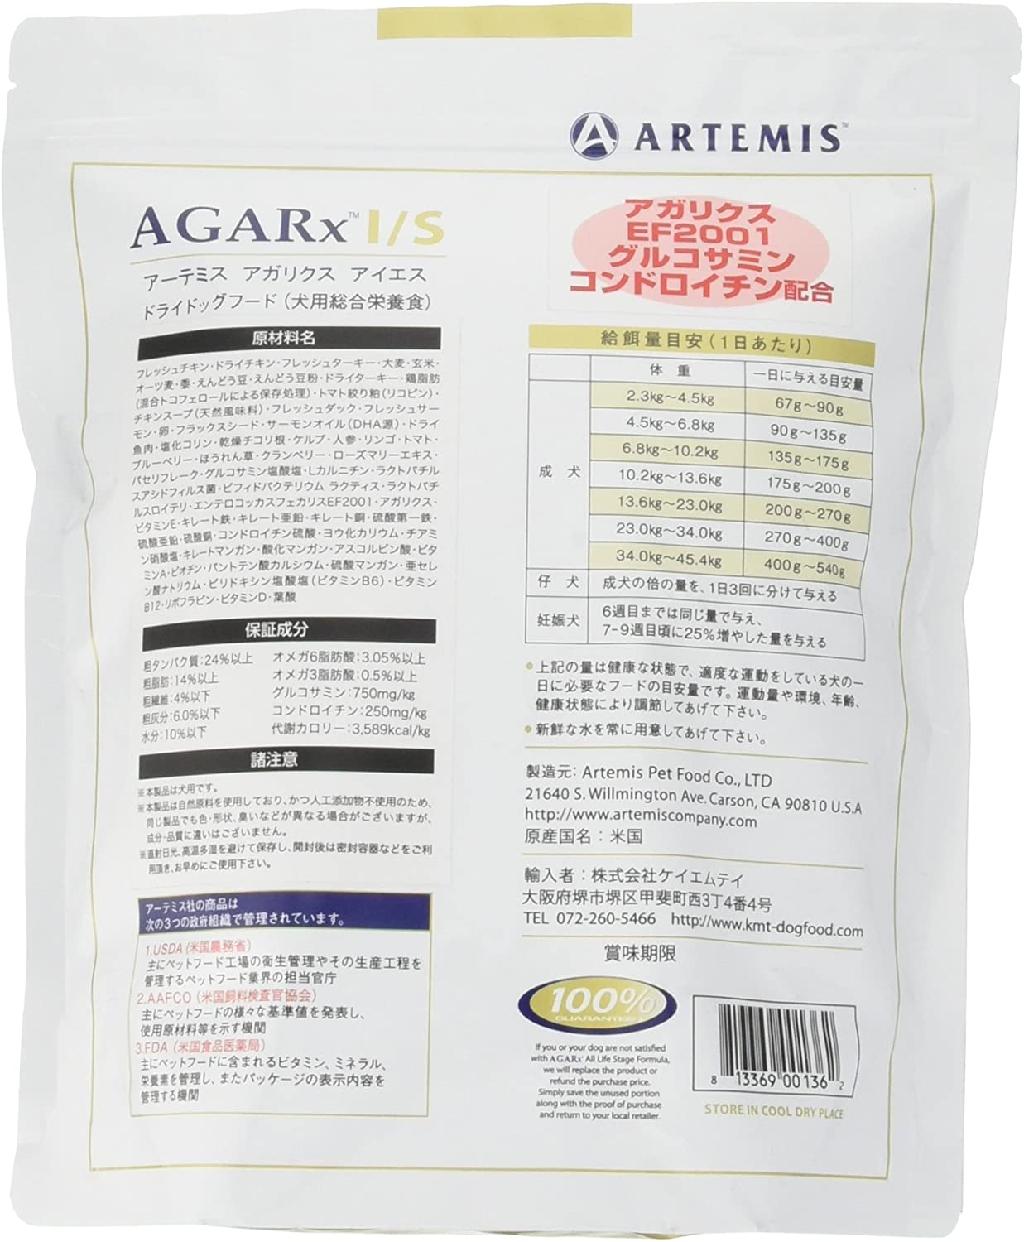 Artemis(アーテミス) アガリクスイミューンサポートの商品画像6